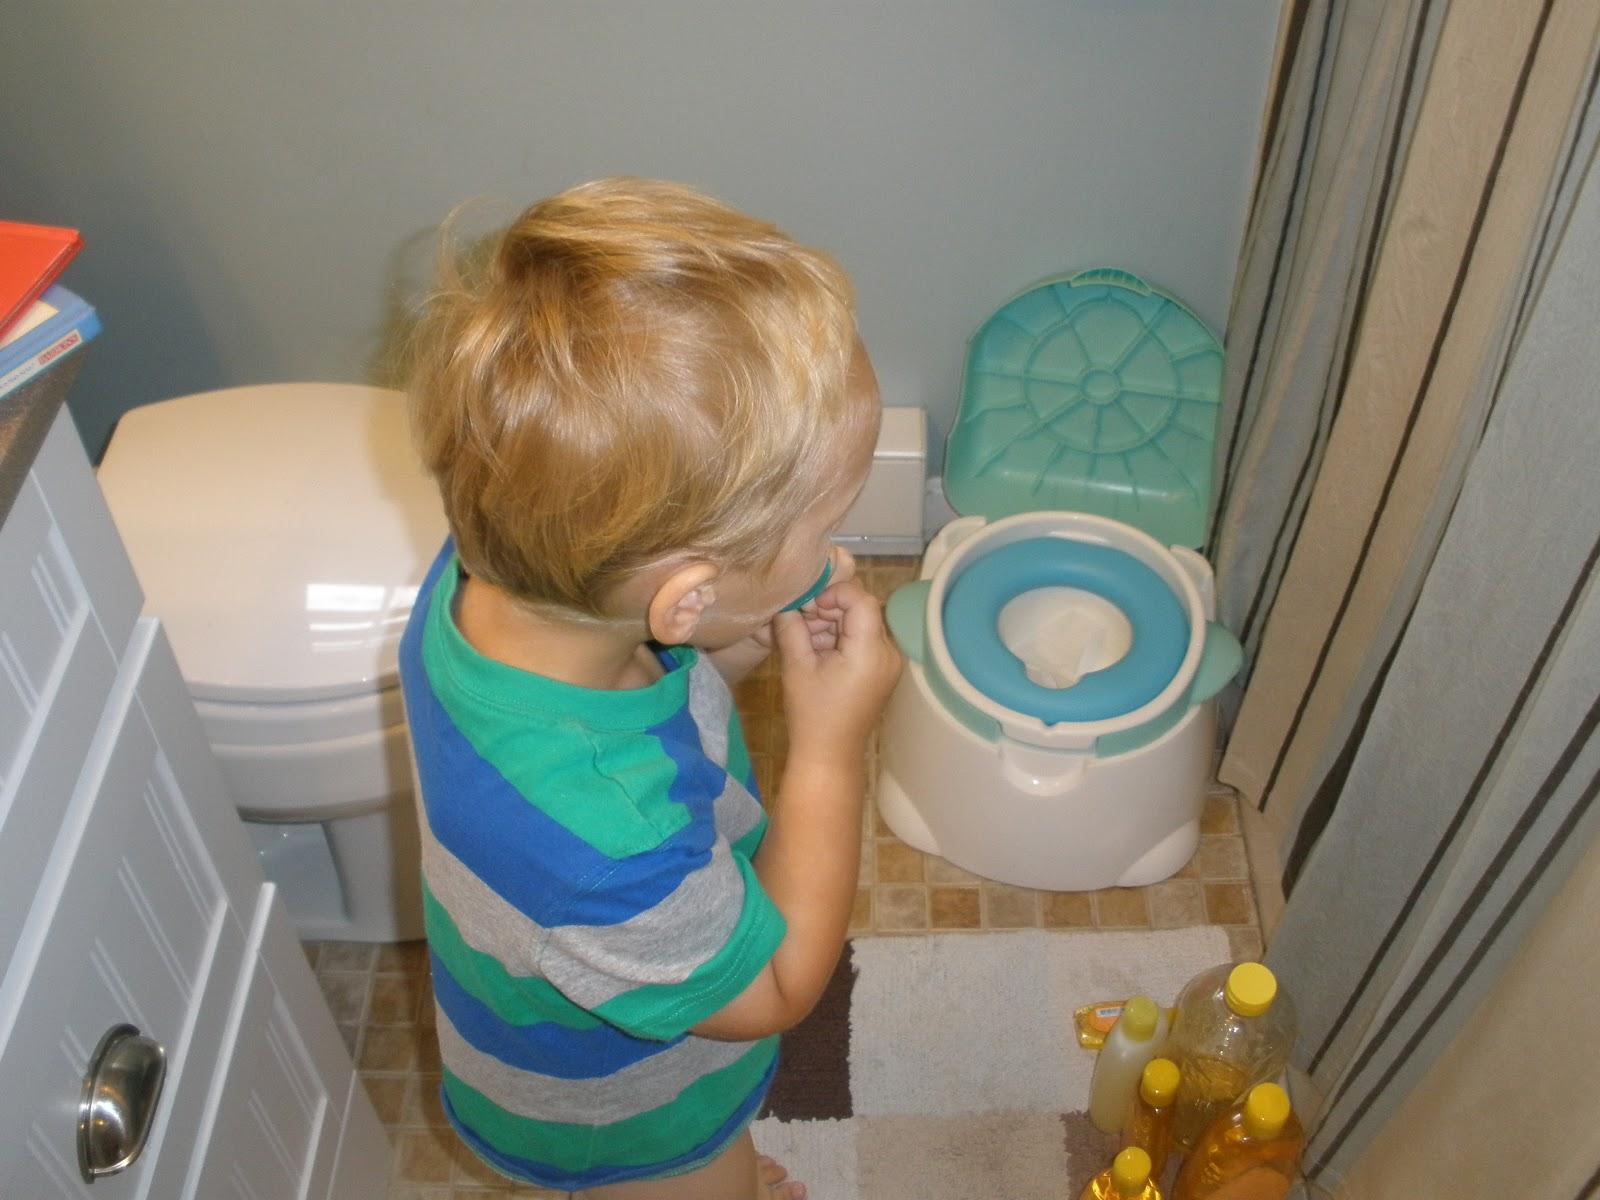 Older Kids Wearing Diapers Stories  Kids Matttroy-4563